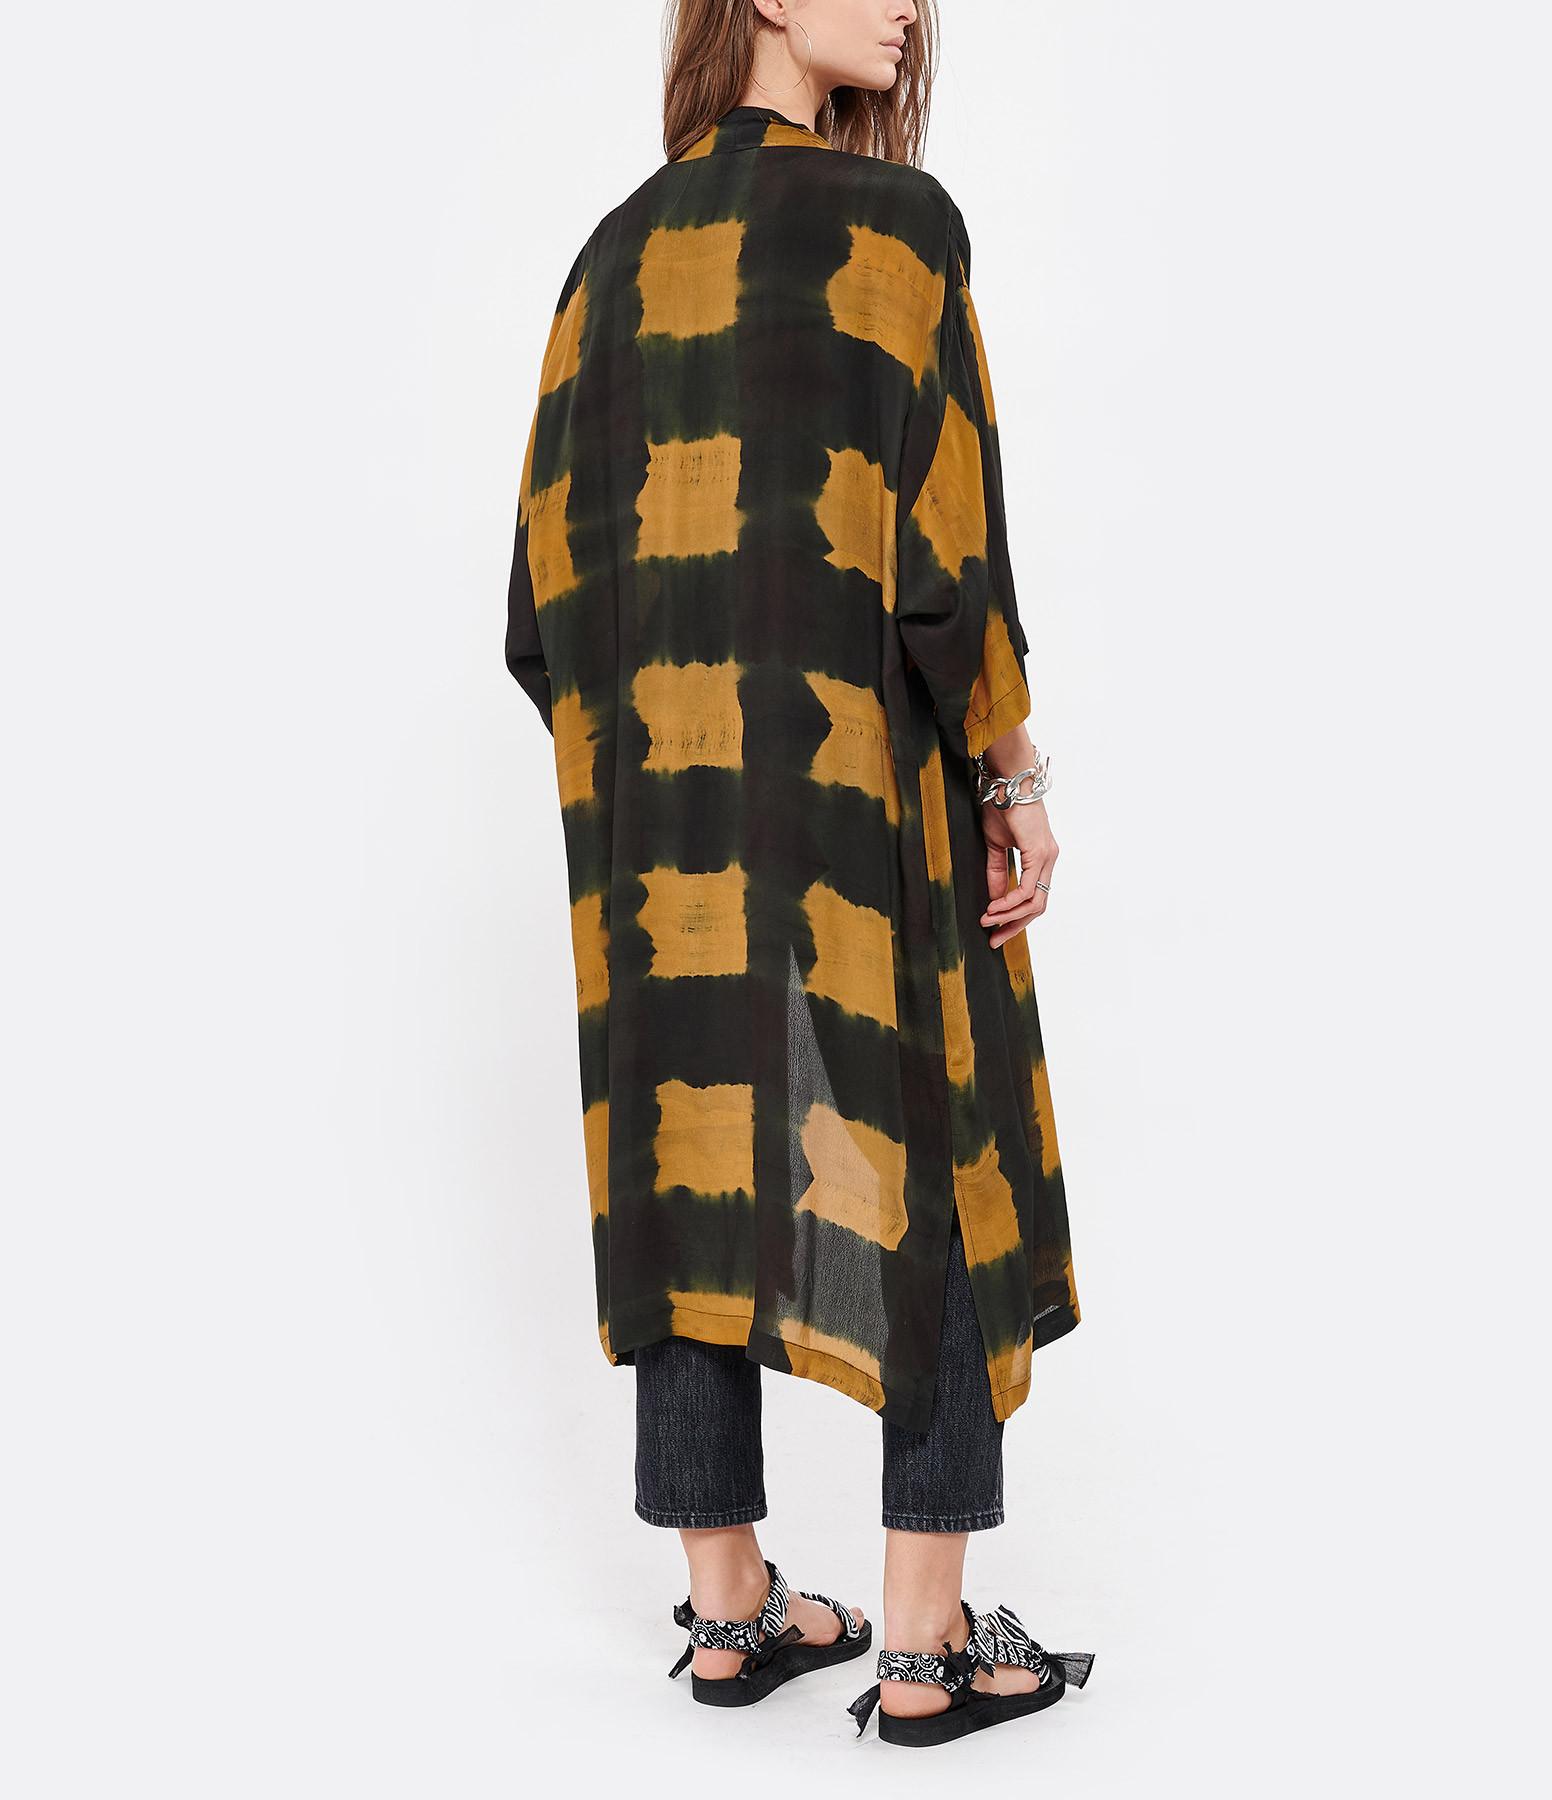 NOUS - Kimono Cléo Crêpe Gris Anthracite Caramel